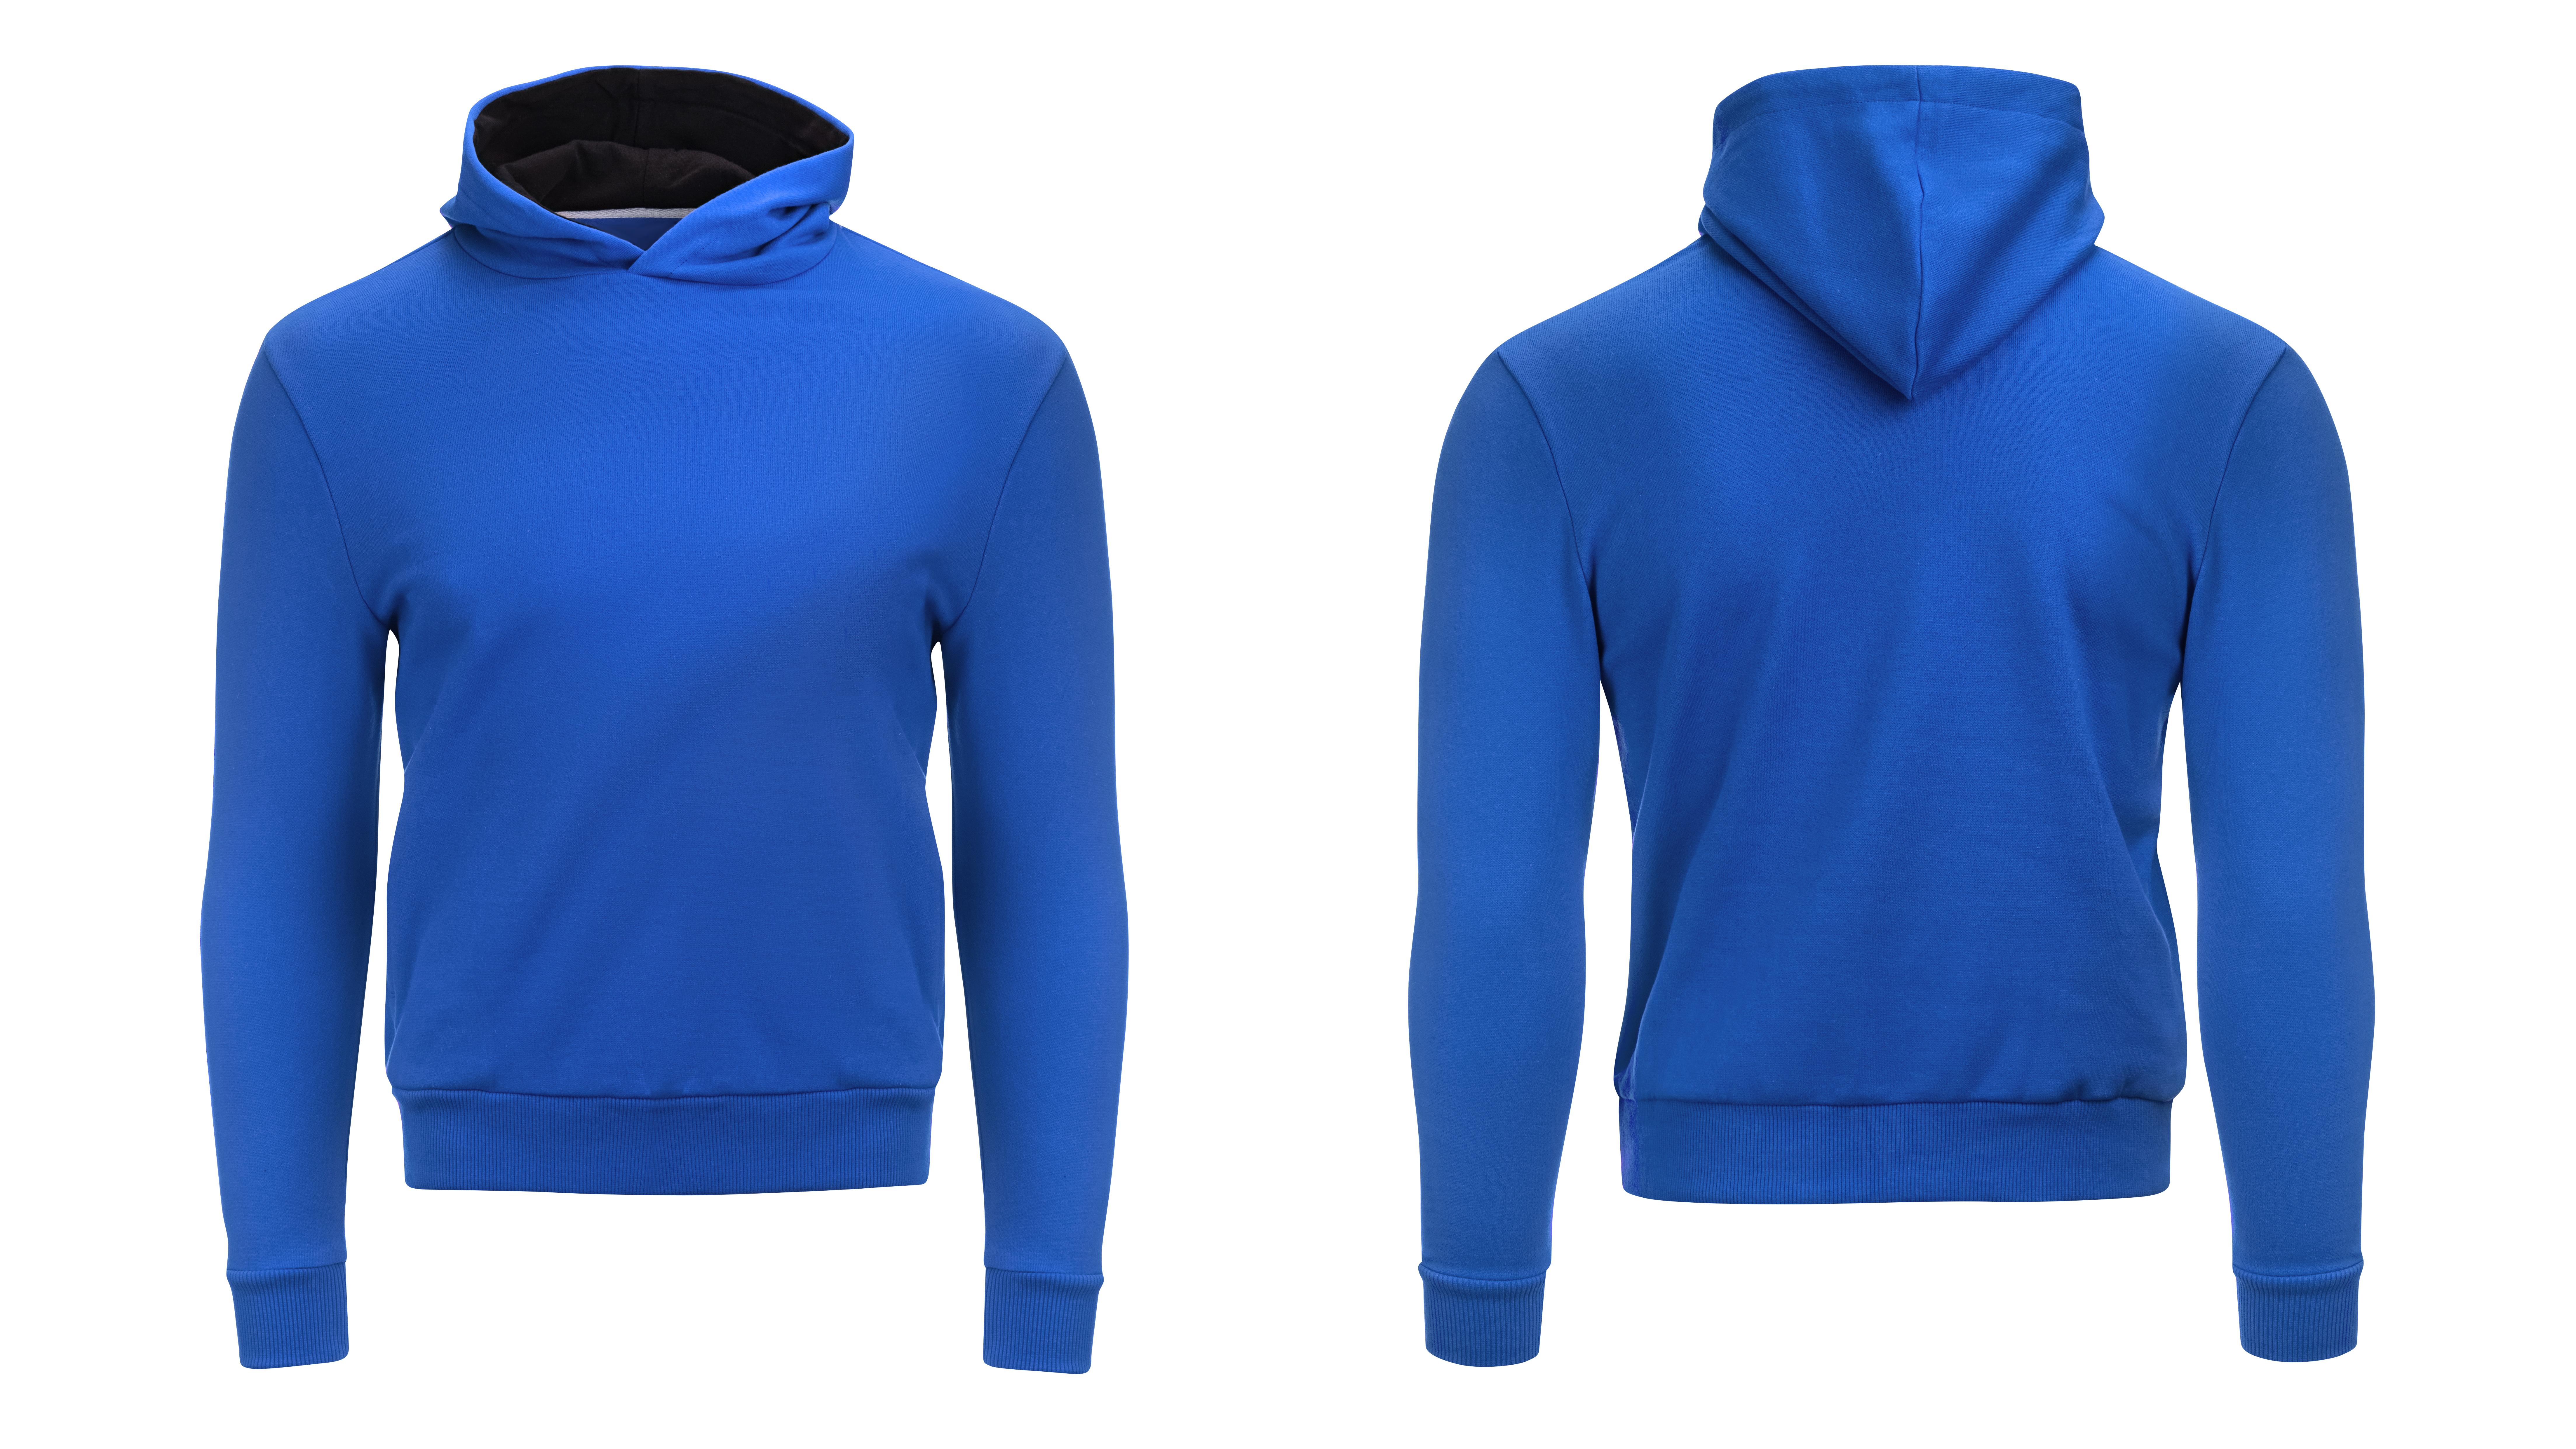 Custom made sweatshirts with hood (13)